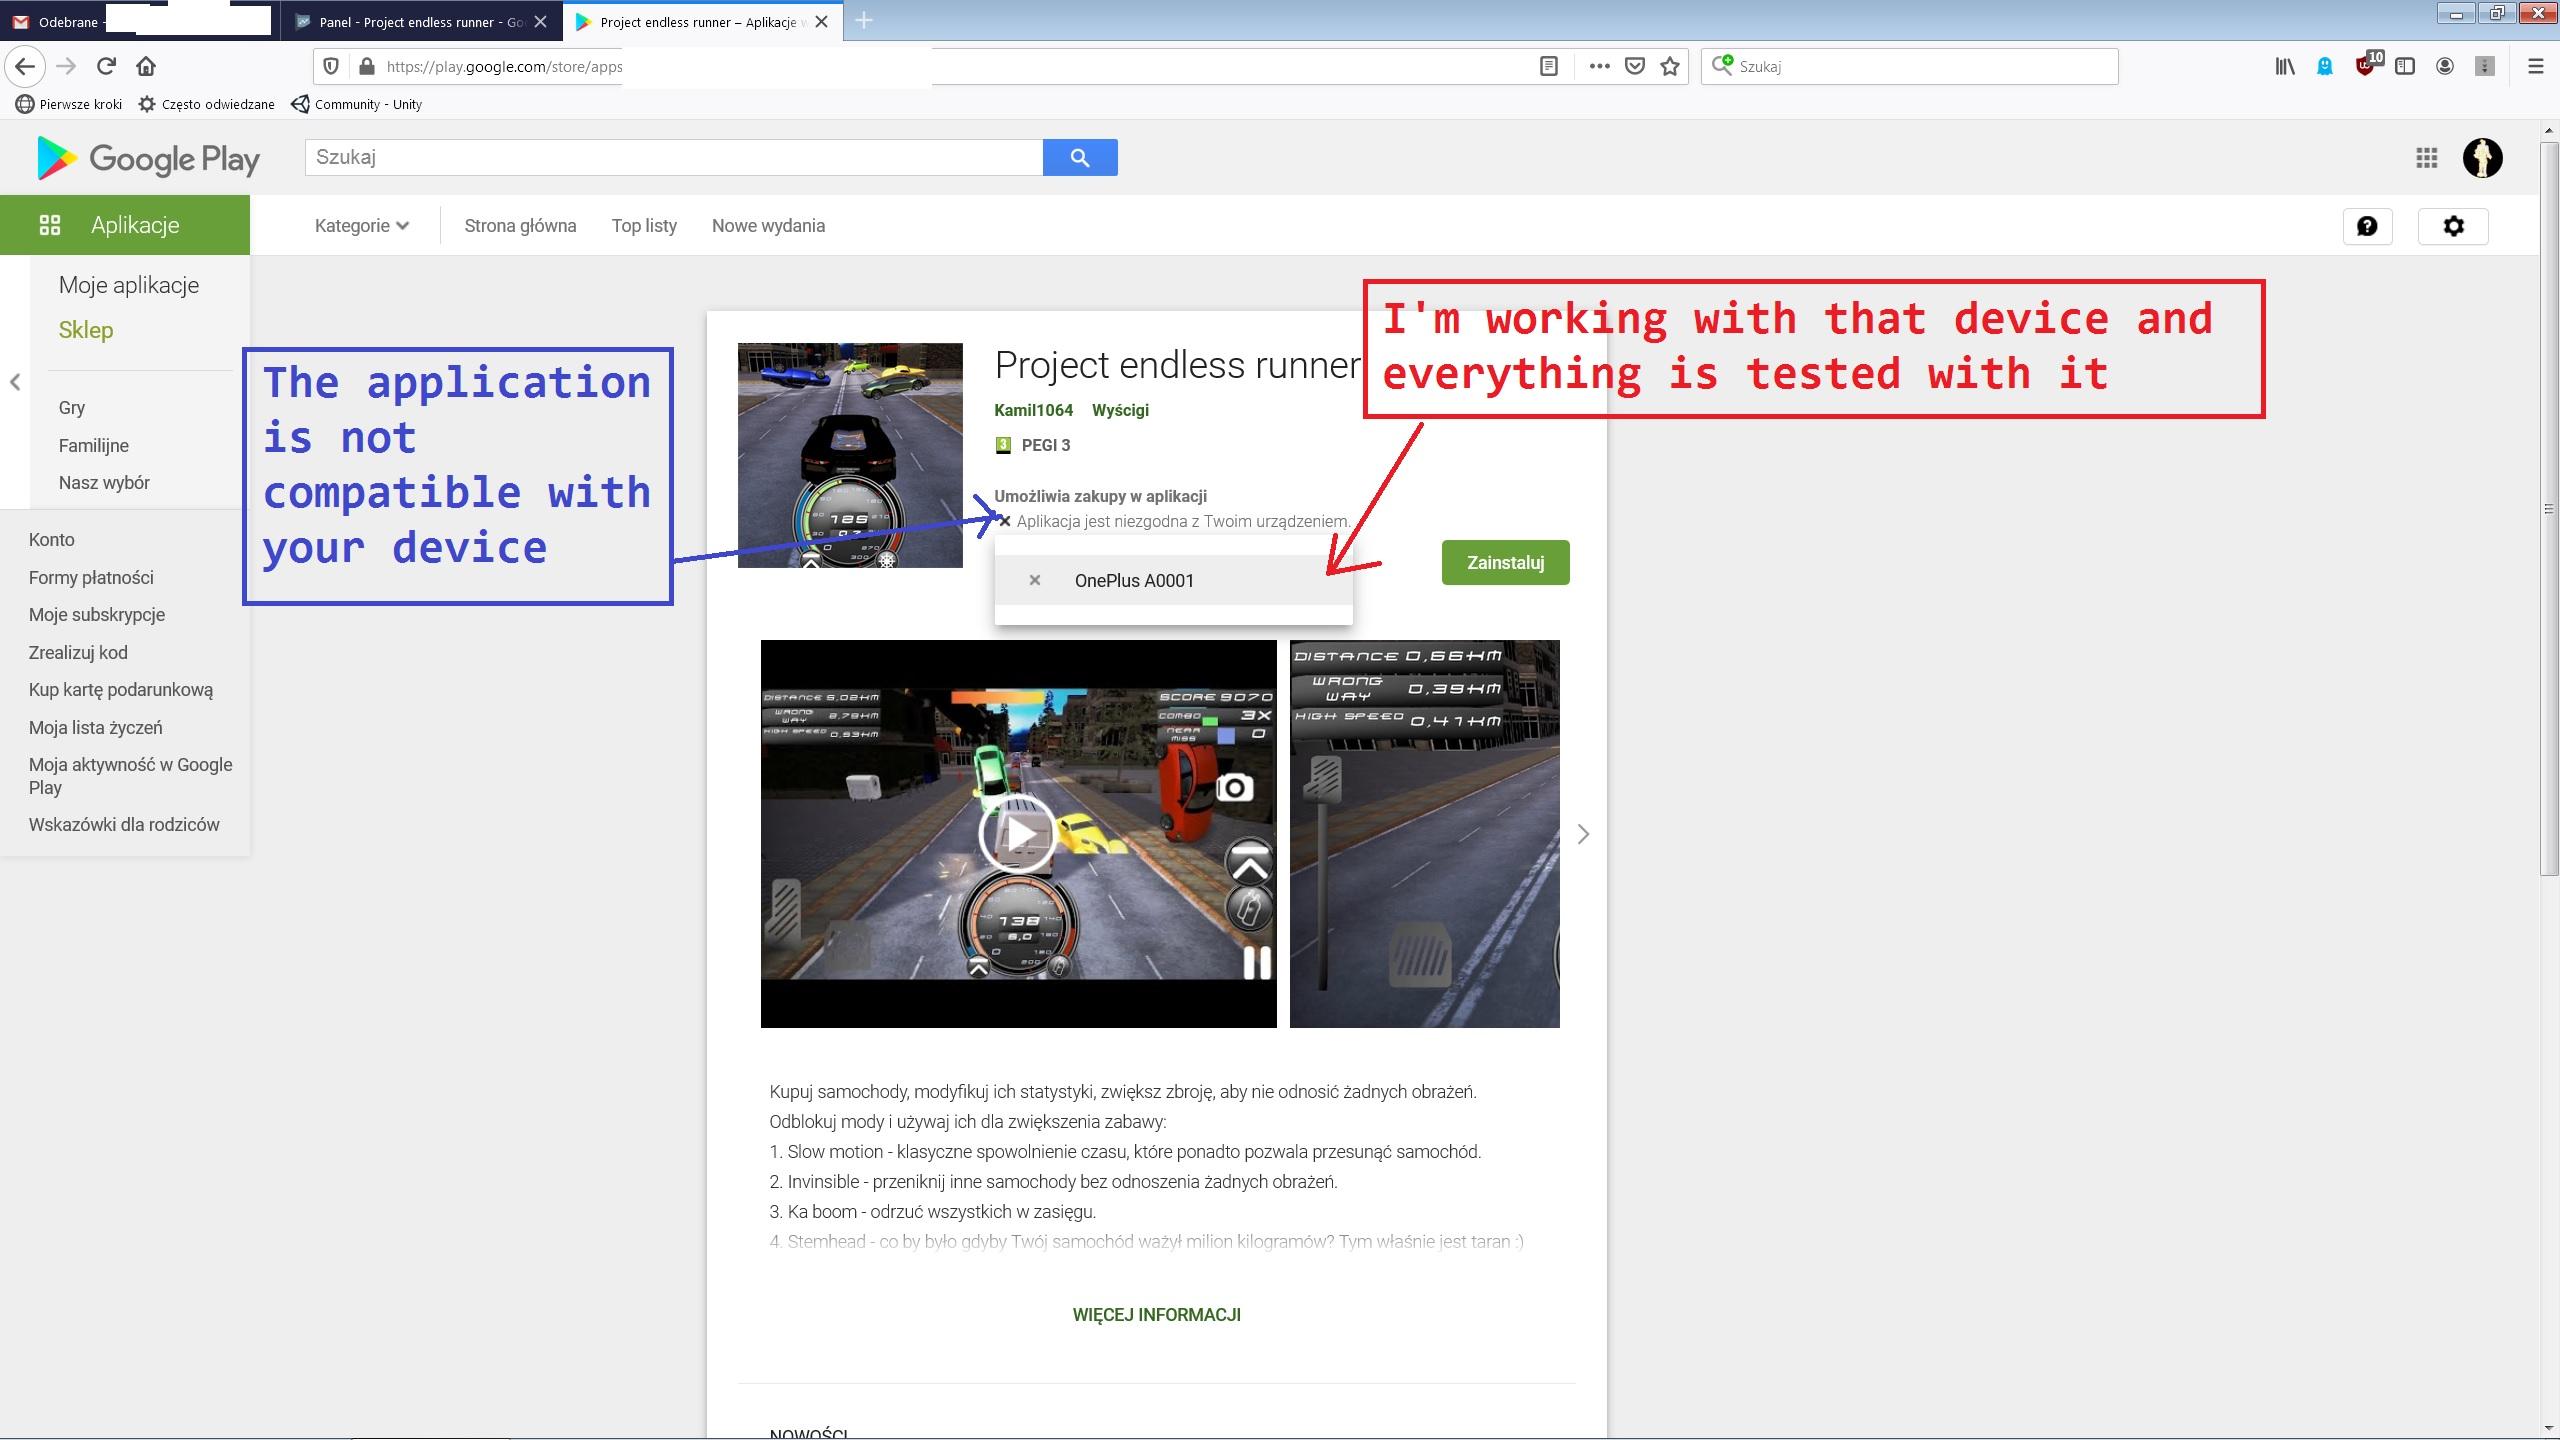 google_WTF_001.jpg